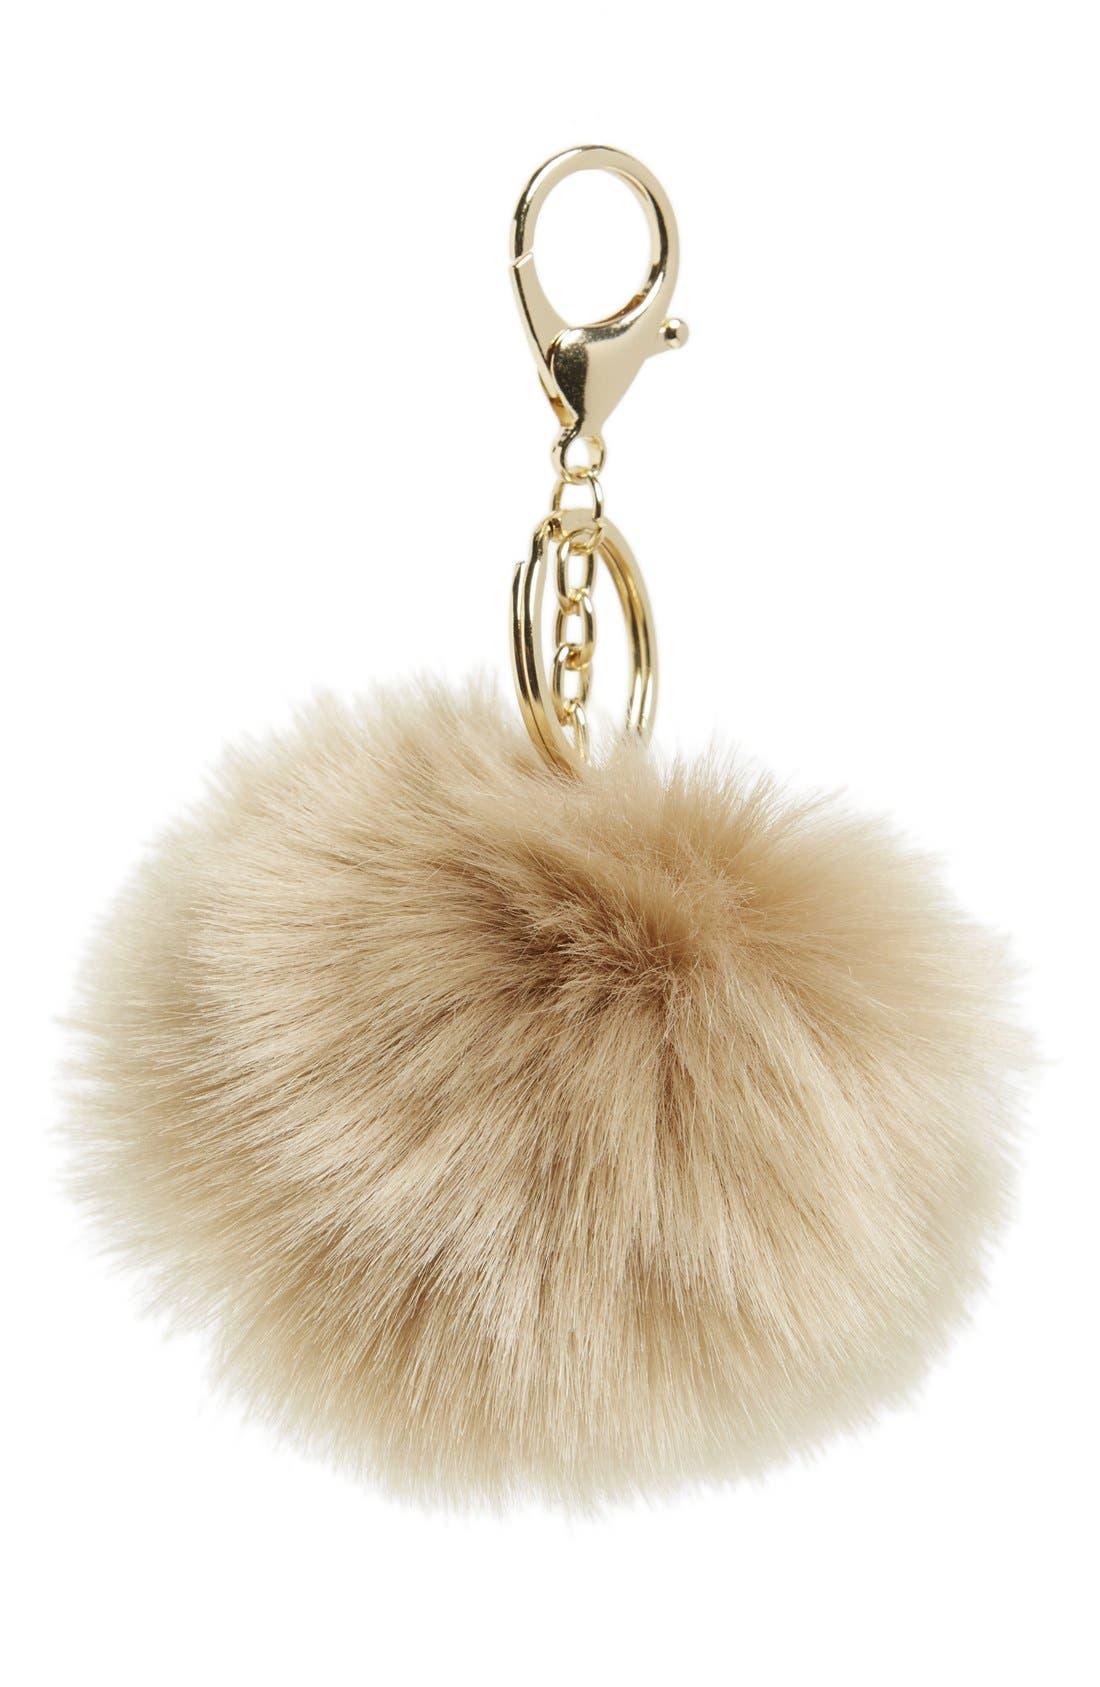 Main Image - Shinhwa Faux Fur Pom Keychain